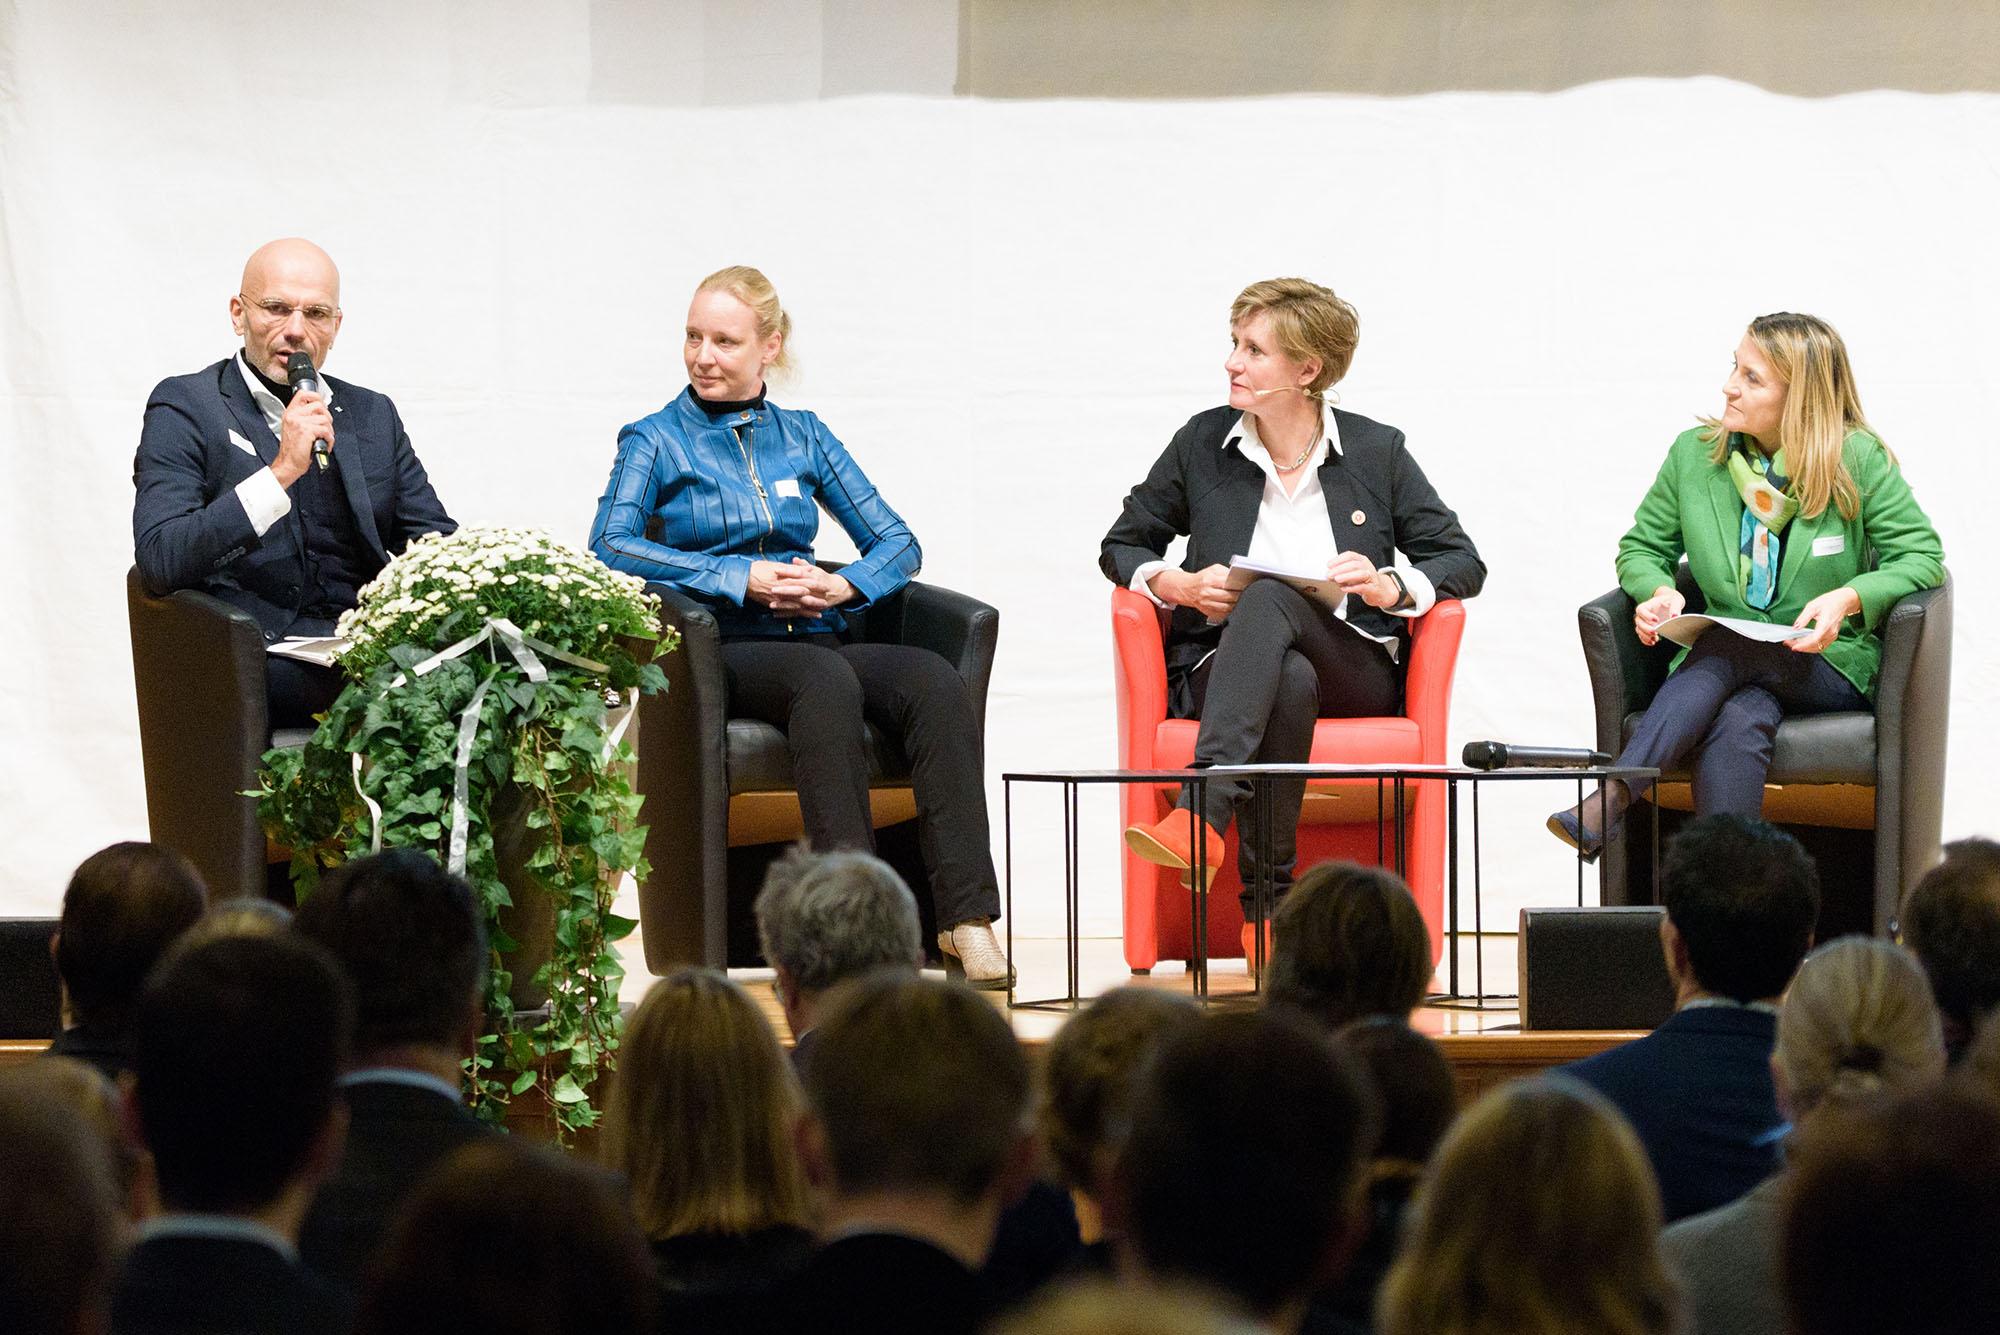 Max Schachinger, Denise Fessler, Katrin Muff, Simona Scarpaleggia